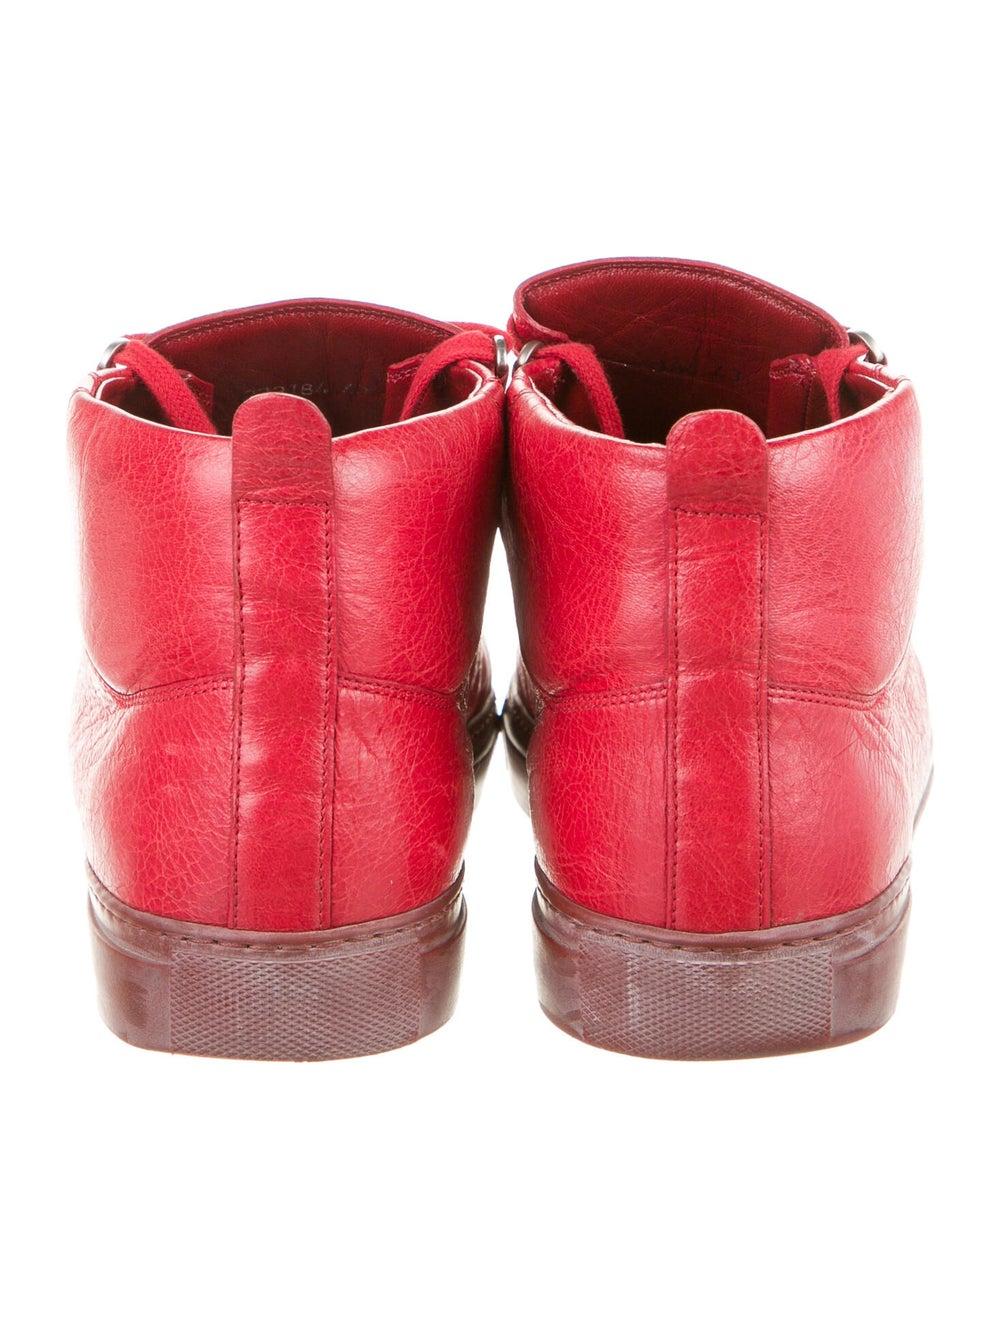 Balenciaga Arena Sneakers Sneakers Red - image 4